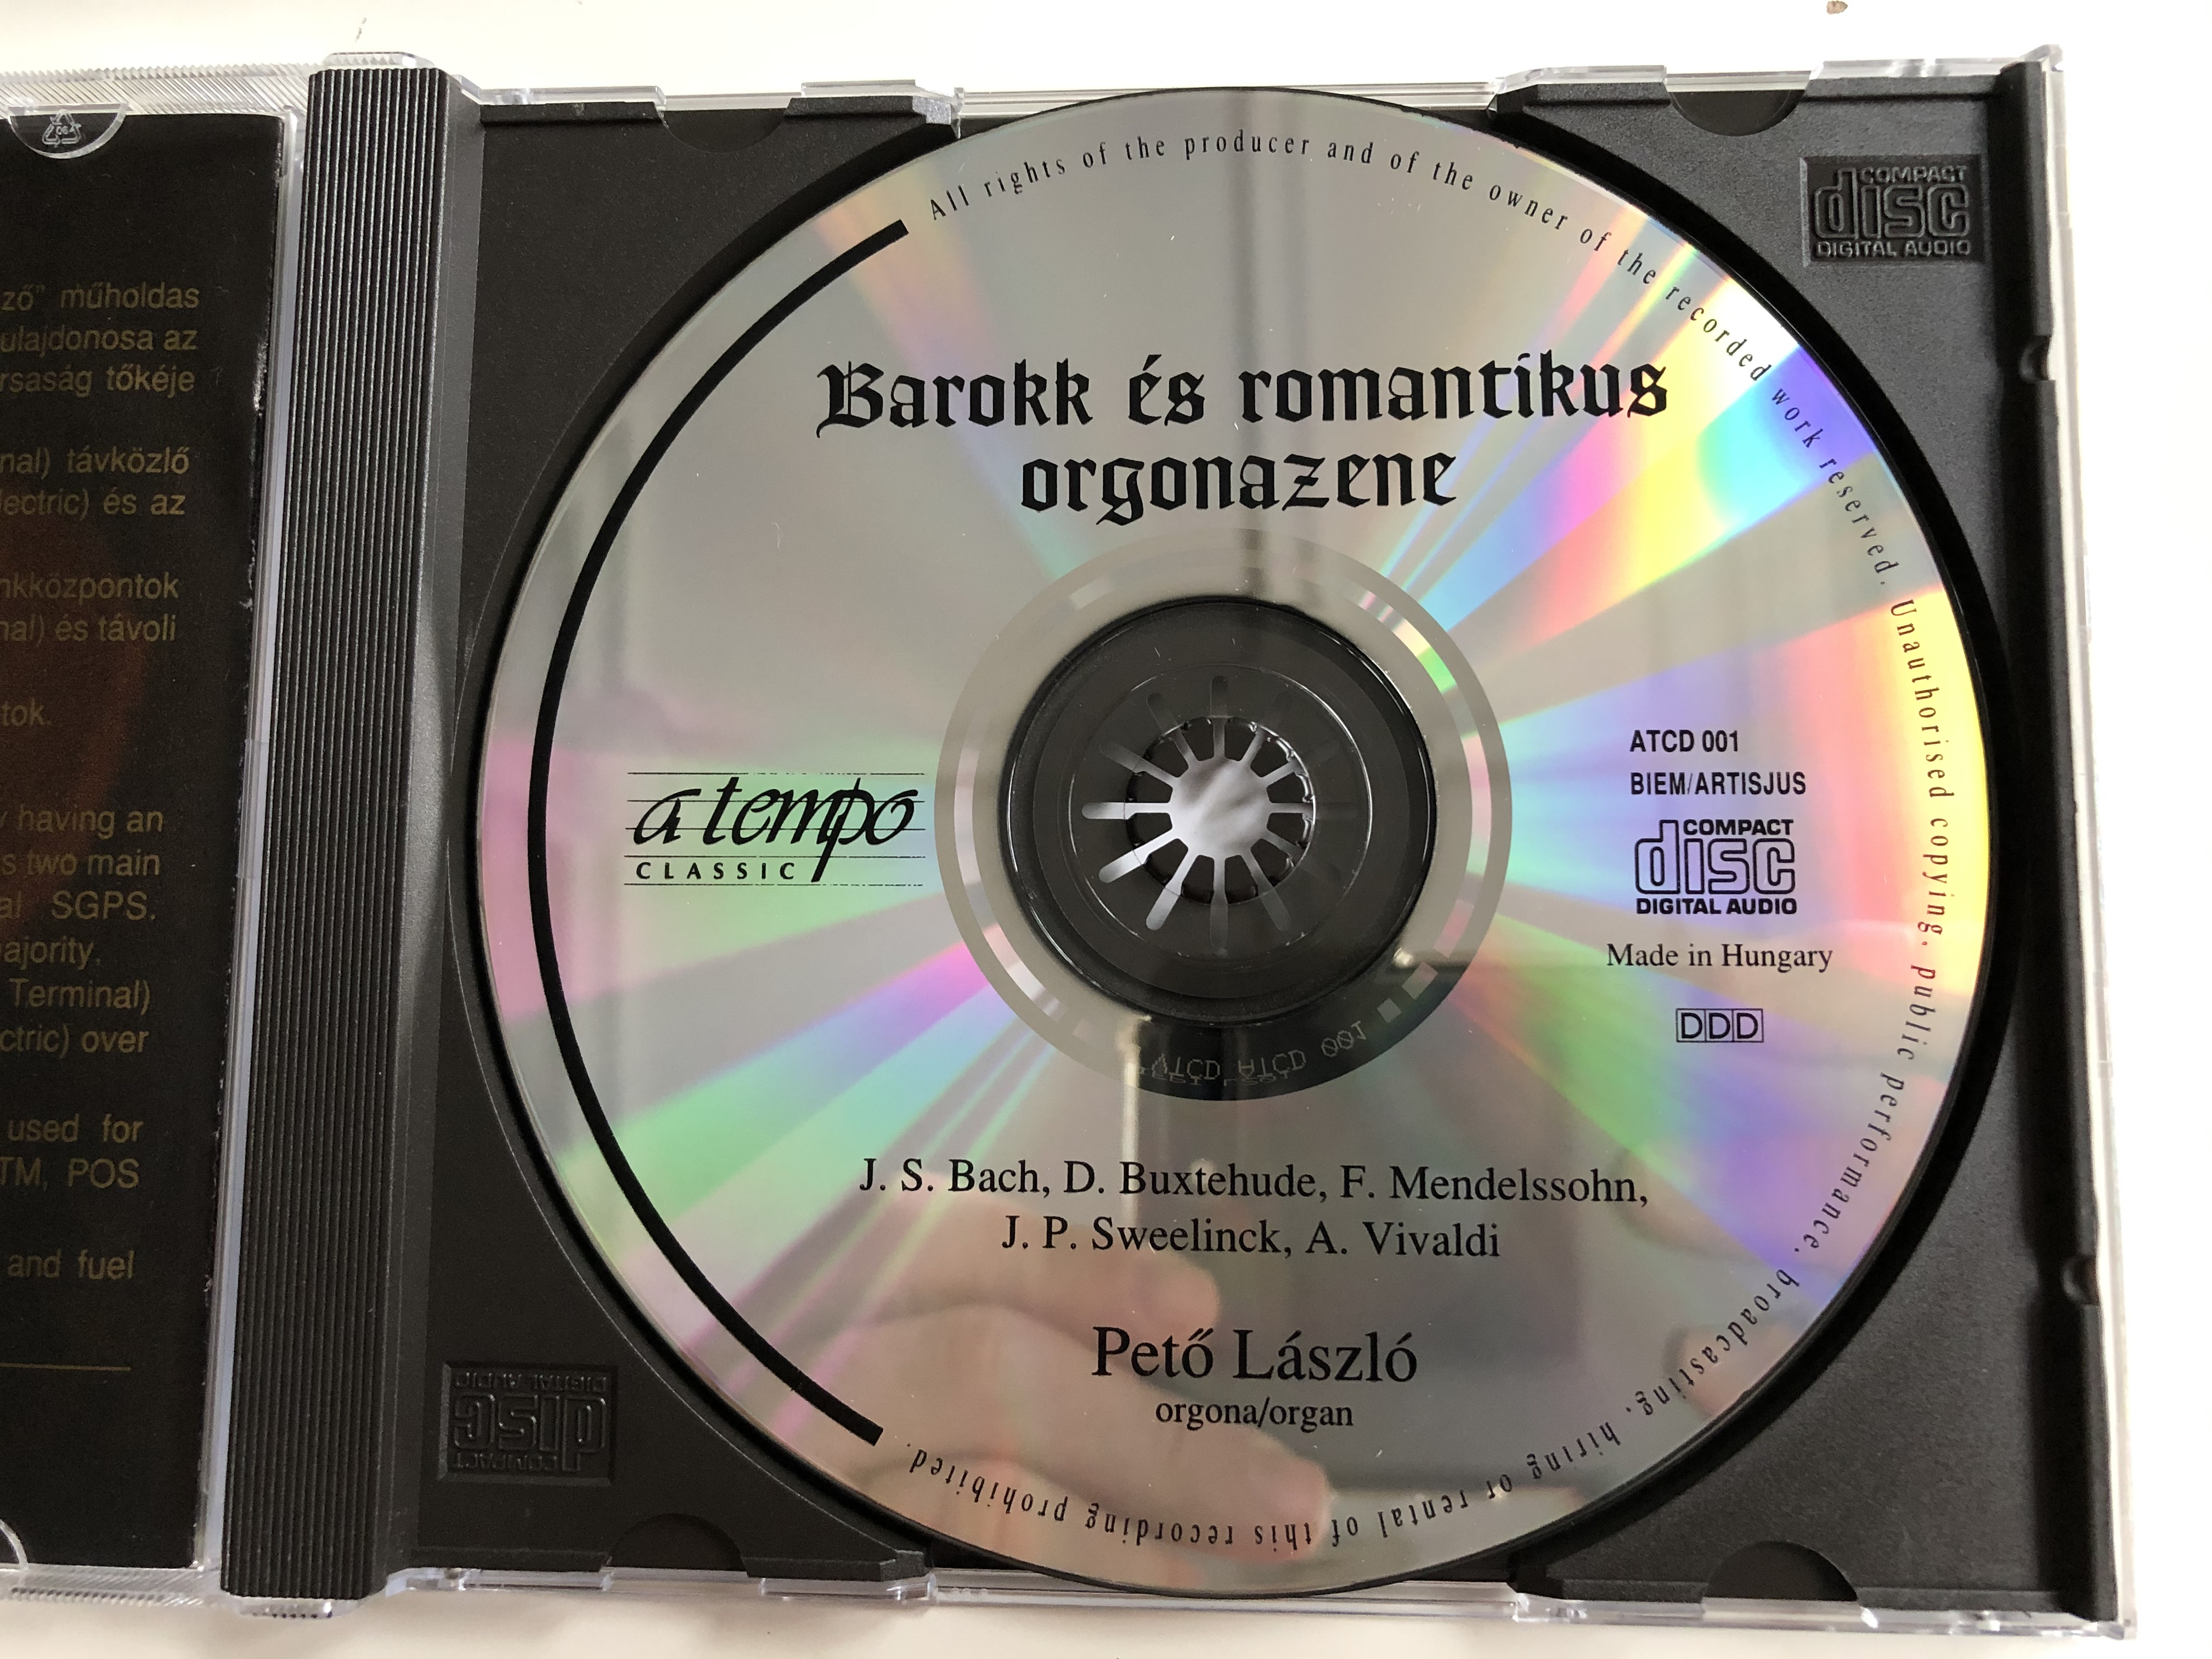 barokk-es-romantikus-organazene-a-tempo-classic-audio-cd-atcd-001-6-.jpg